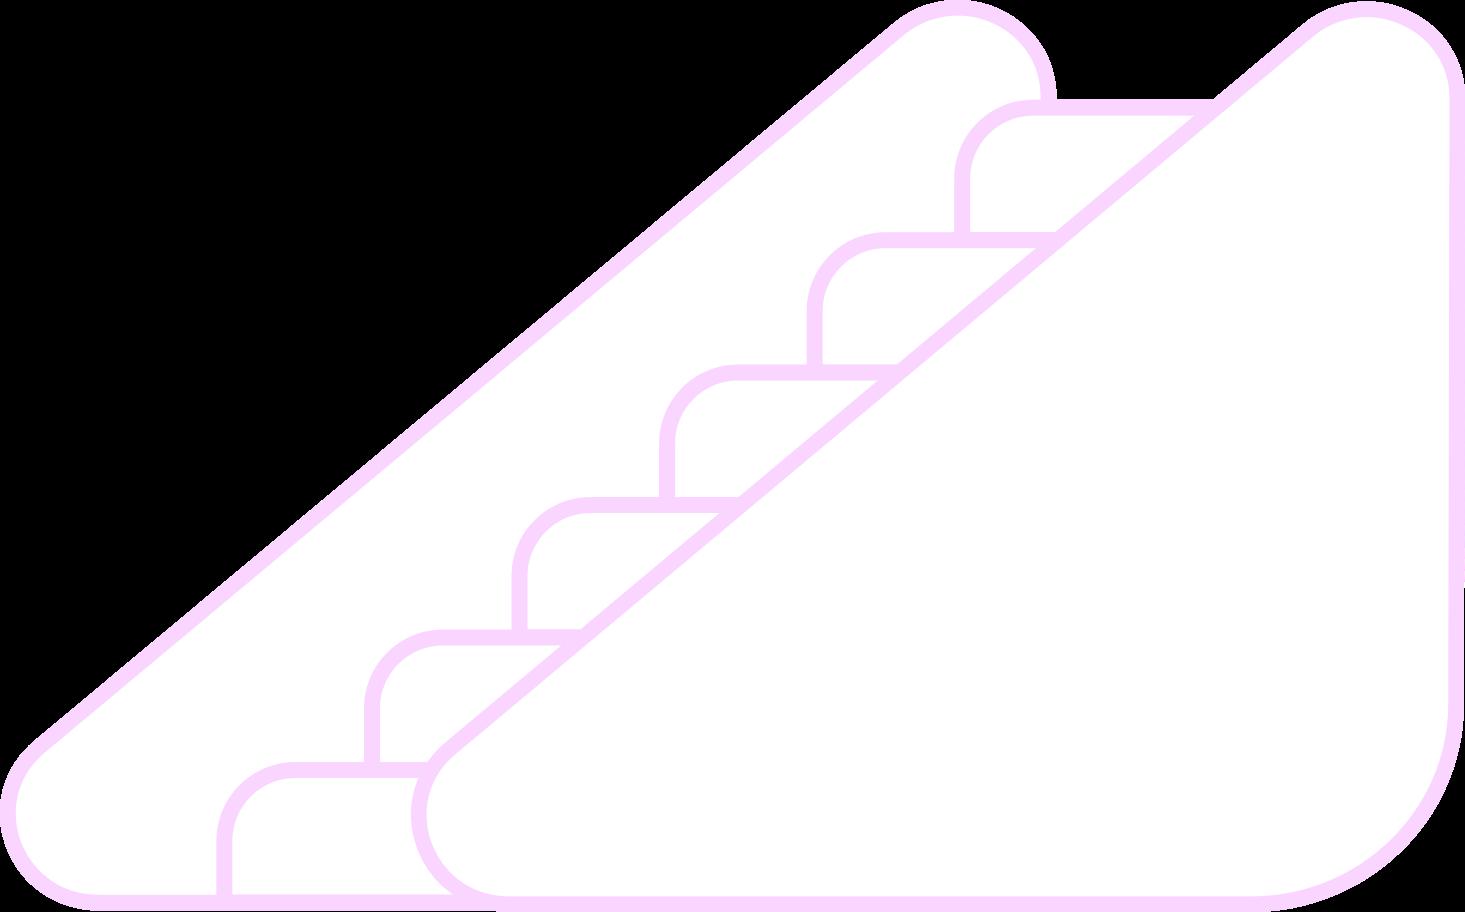 escalator Clipart illustration in PNG, SVG